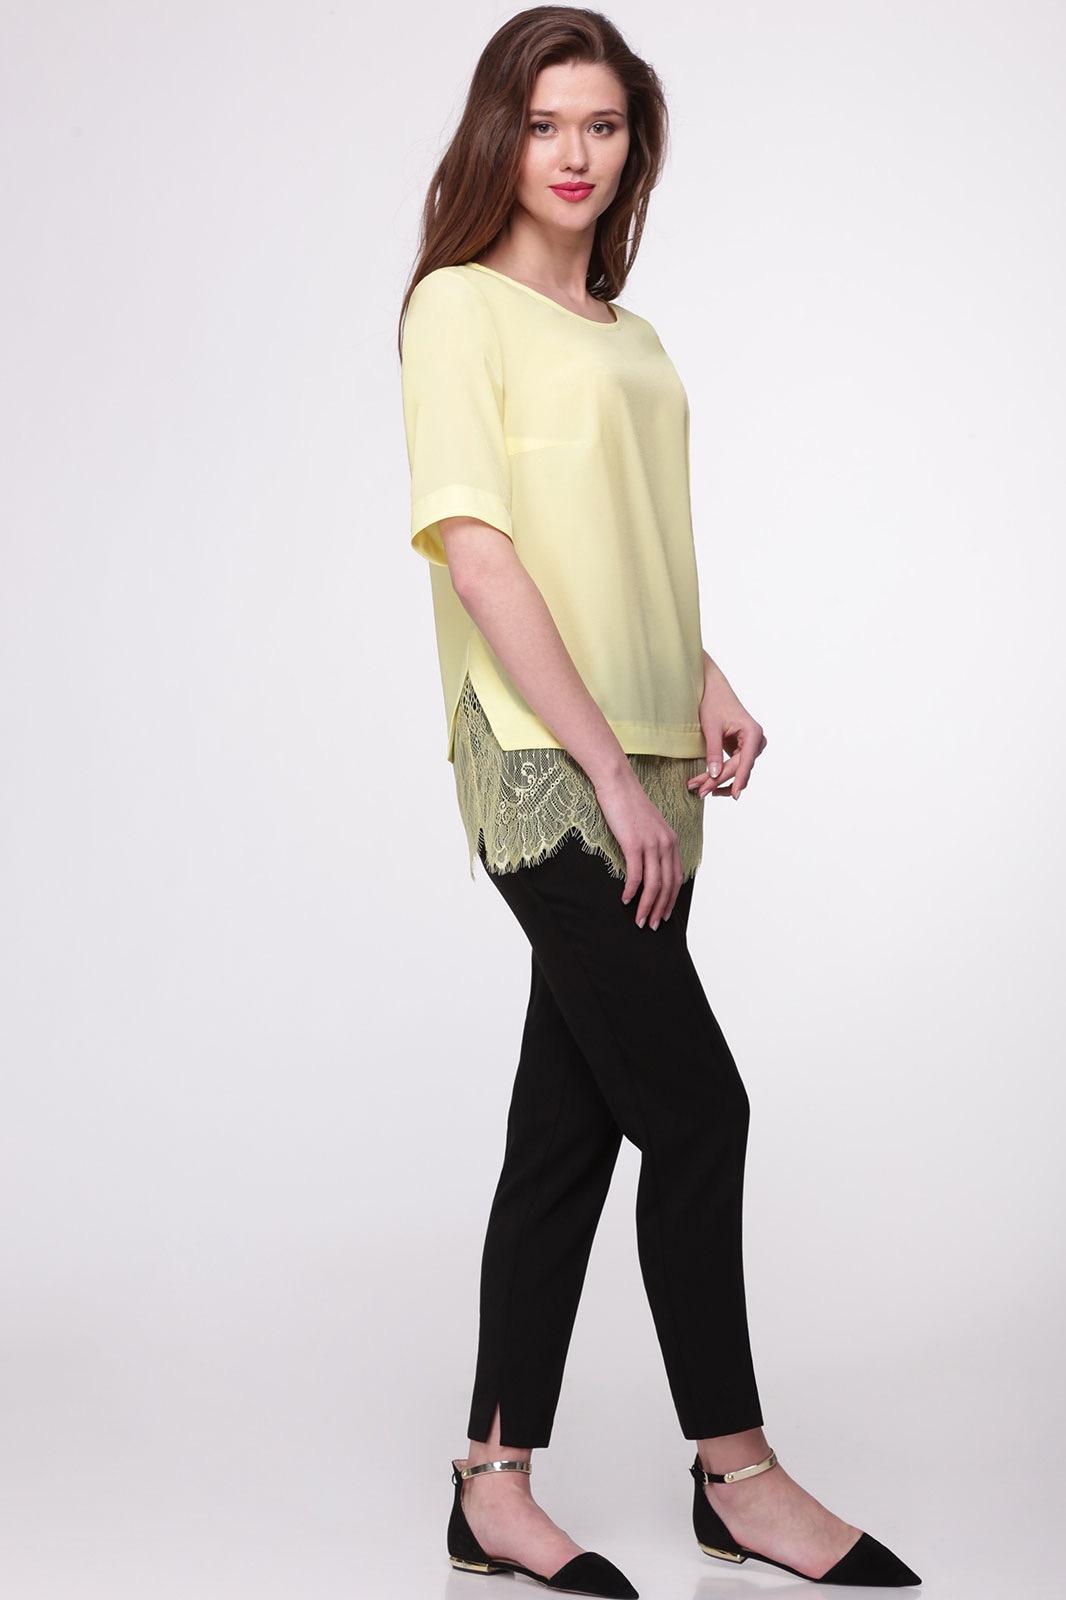 Блузка Faufilure 369С-1 желтые тона - фото 1